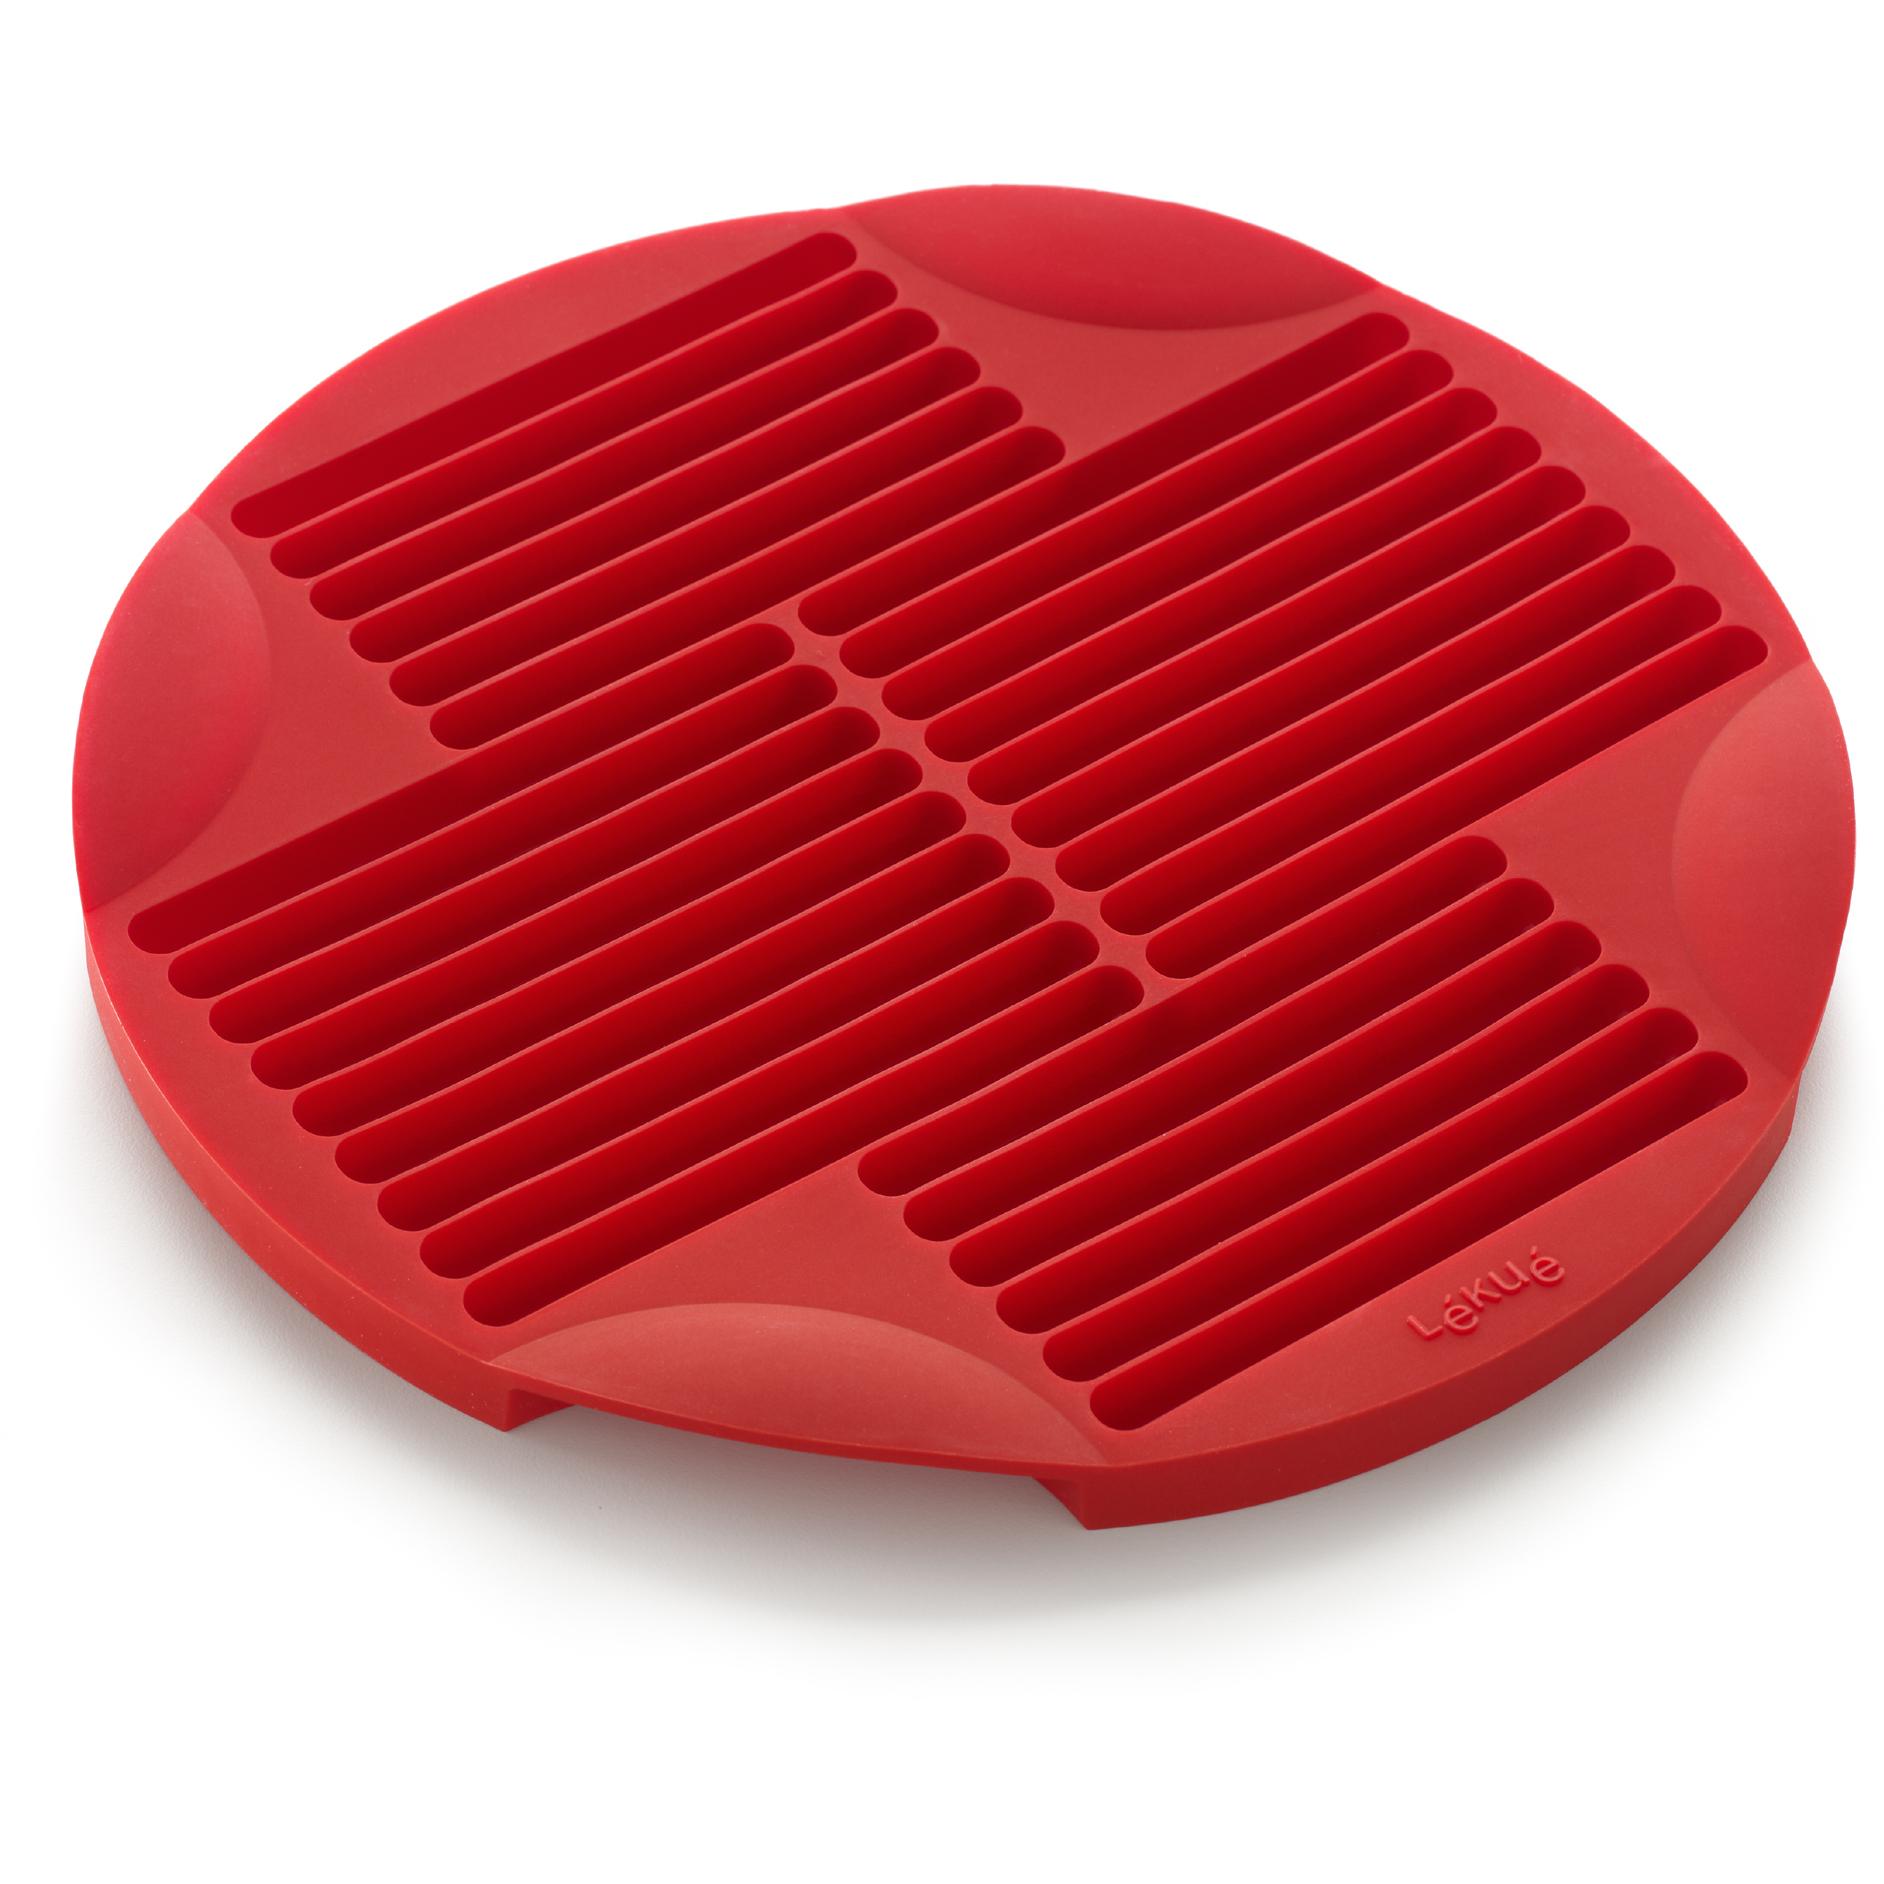 Lekue Red Silicone Bread Stick Mold